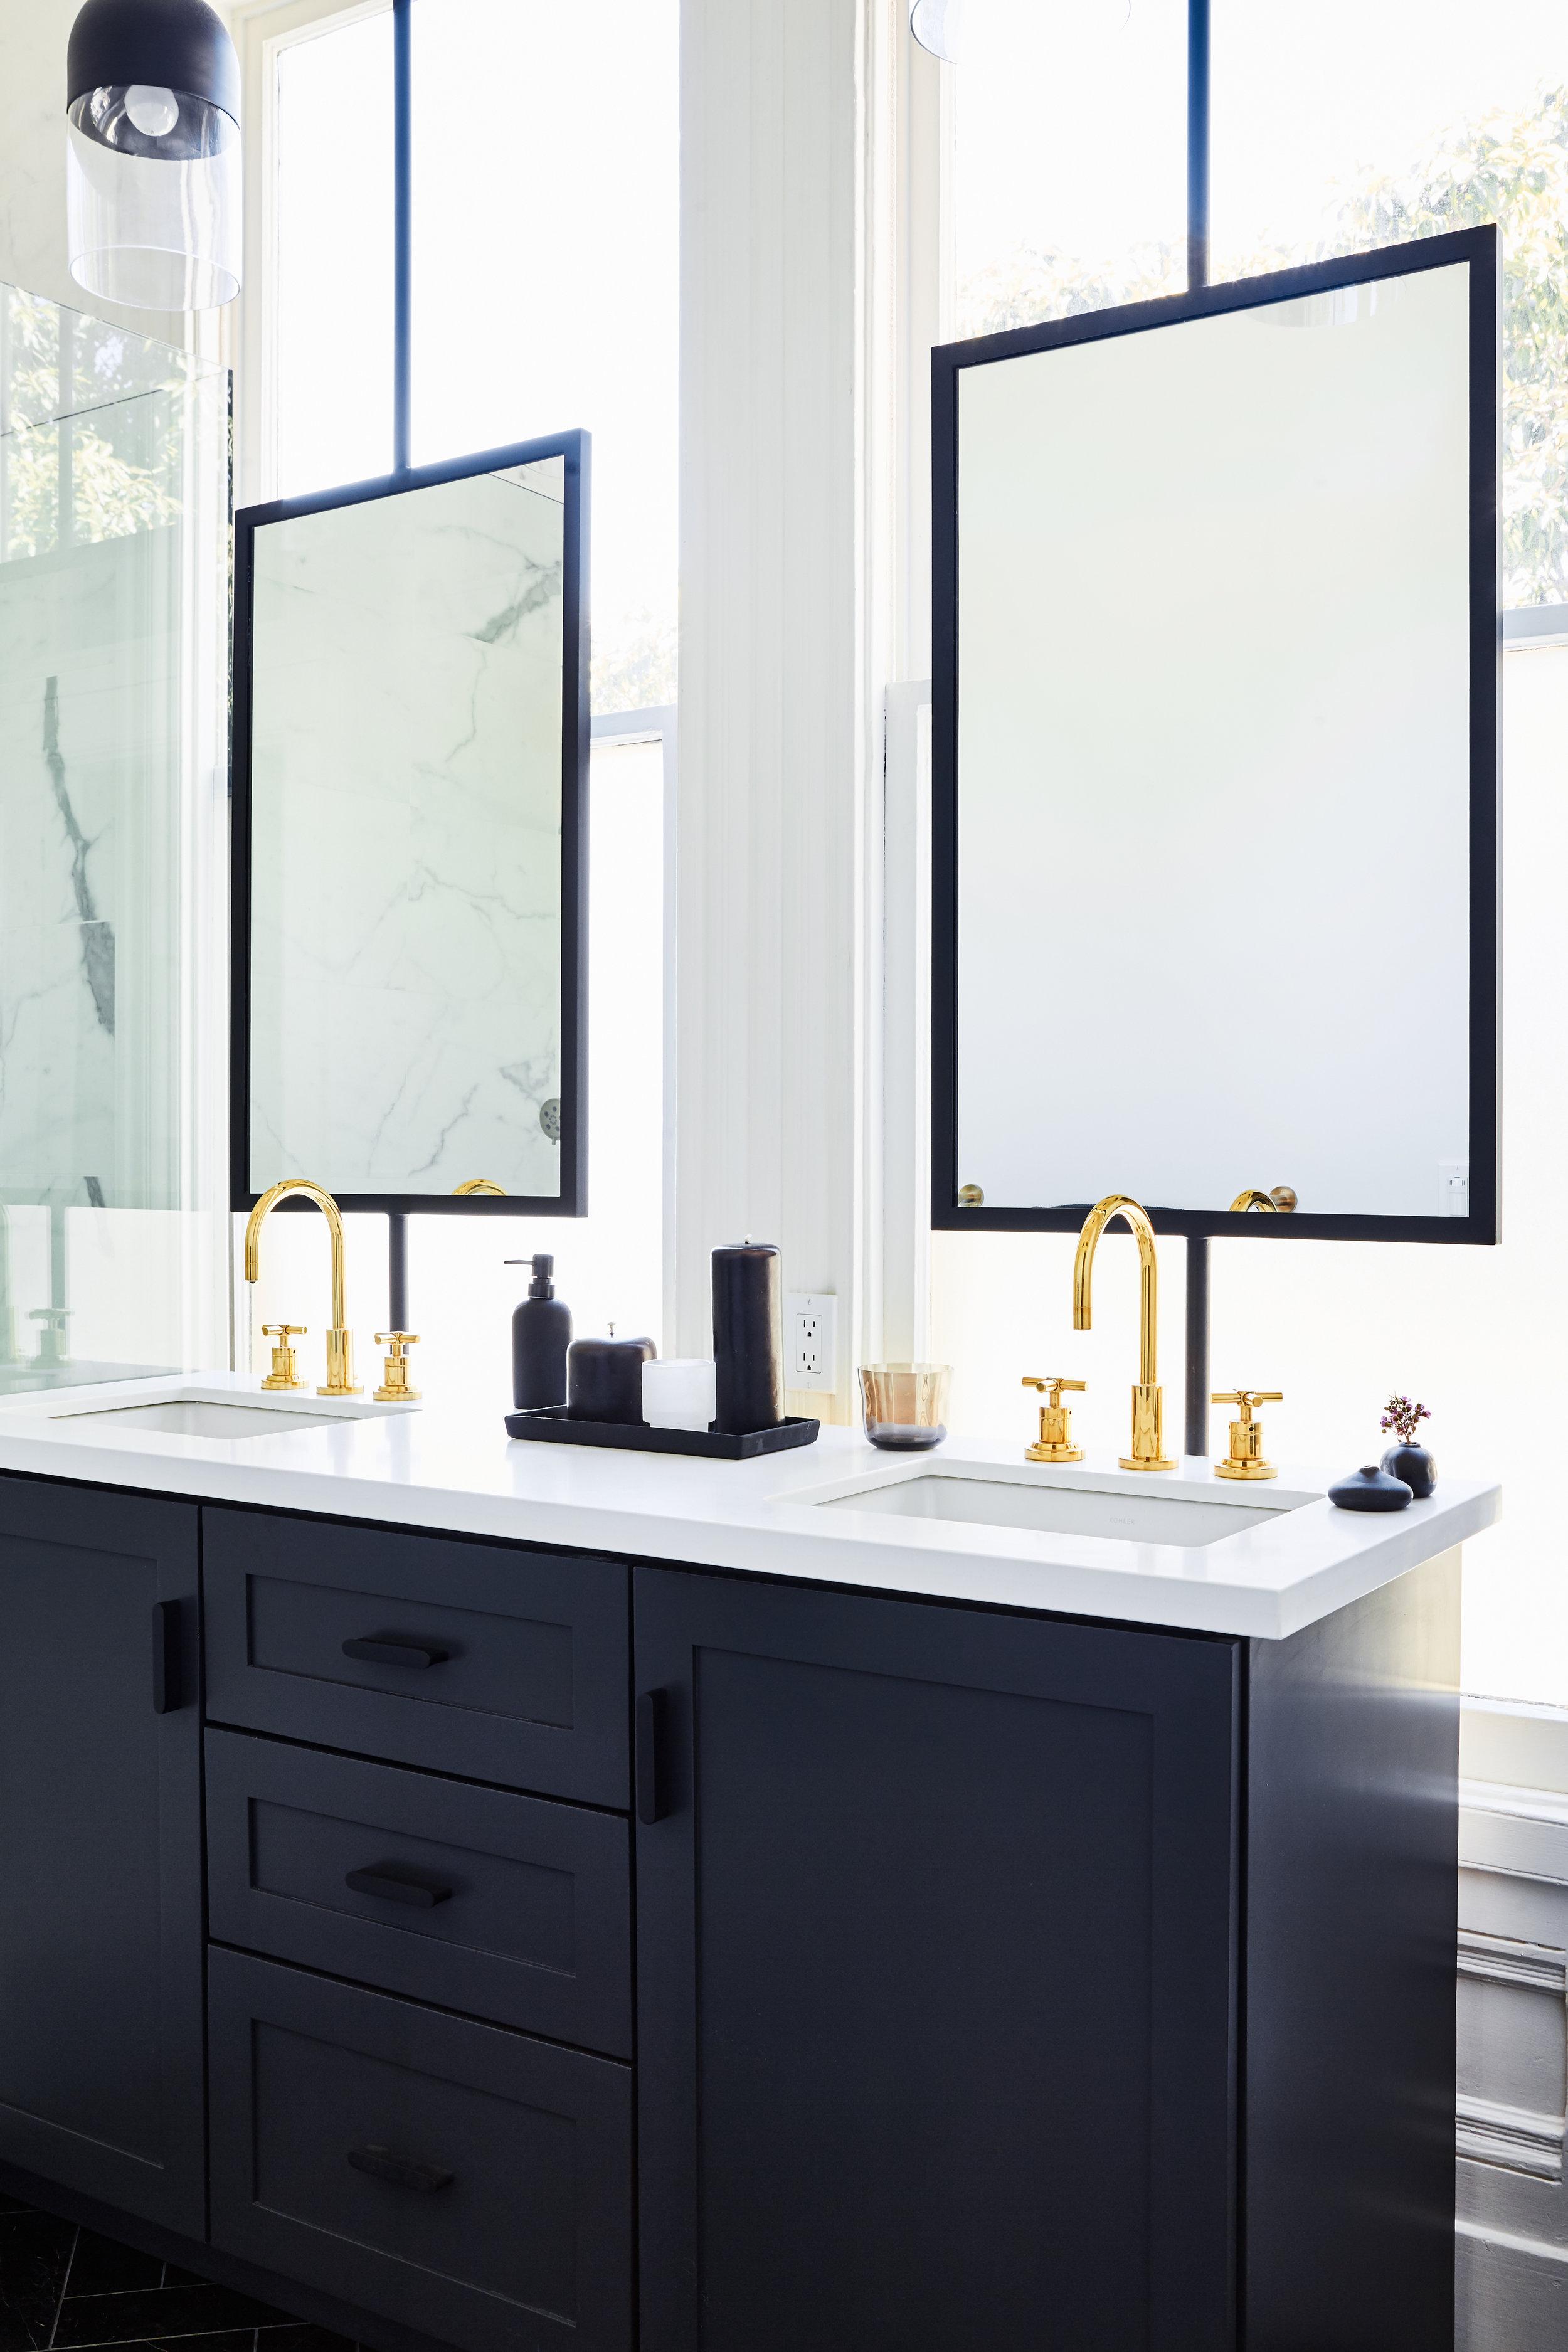 Noz Design - Duboce Flat - 25895.jpg